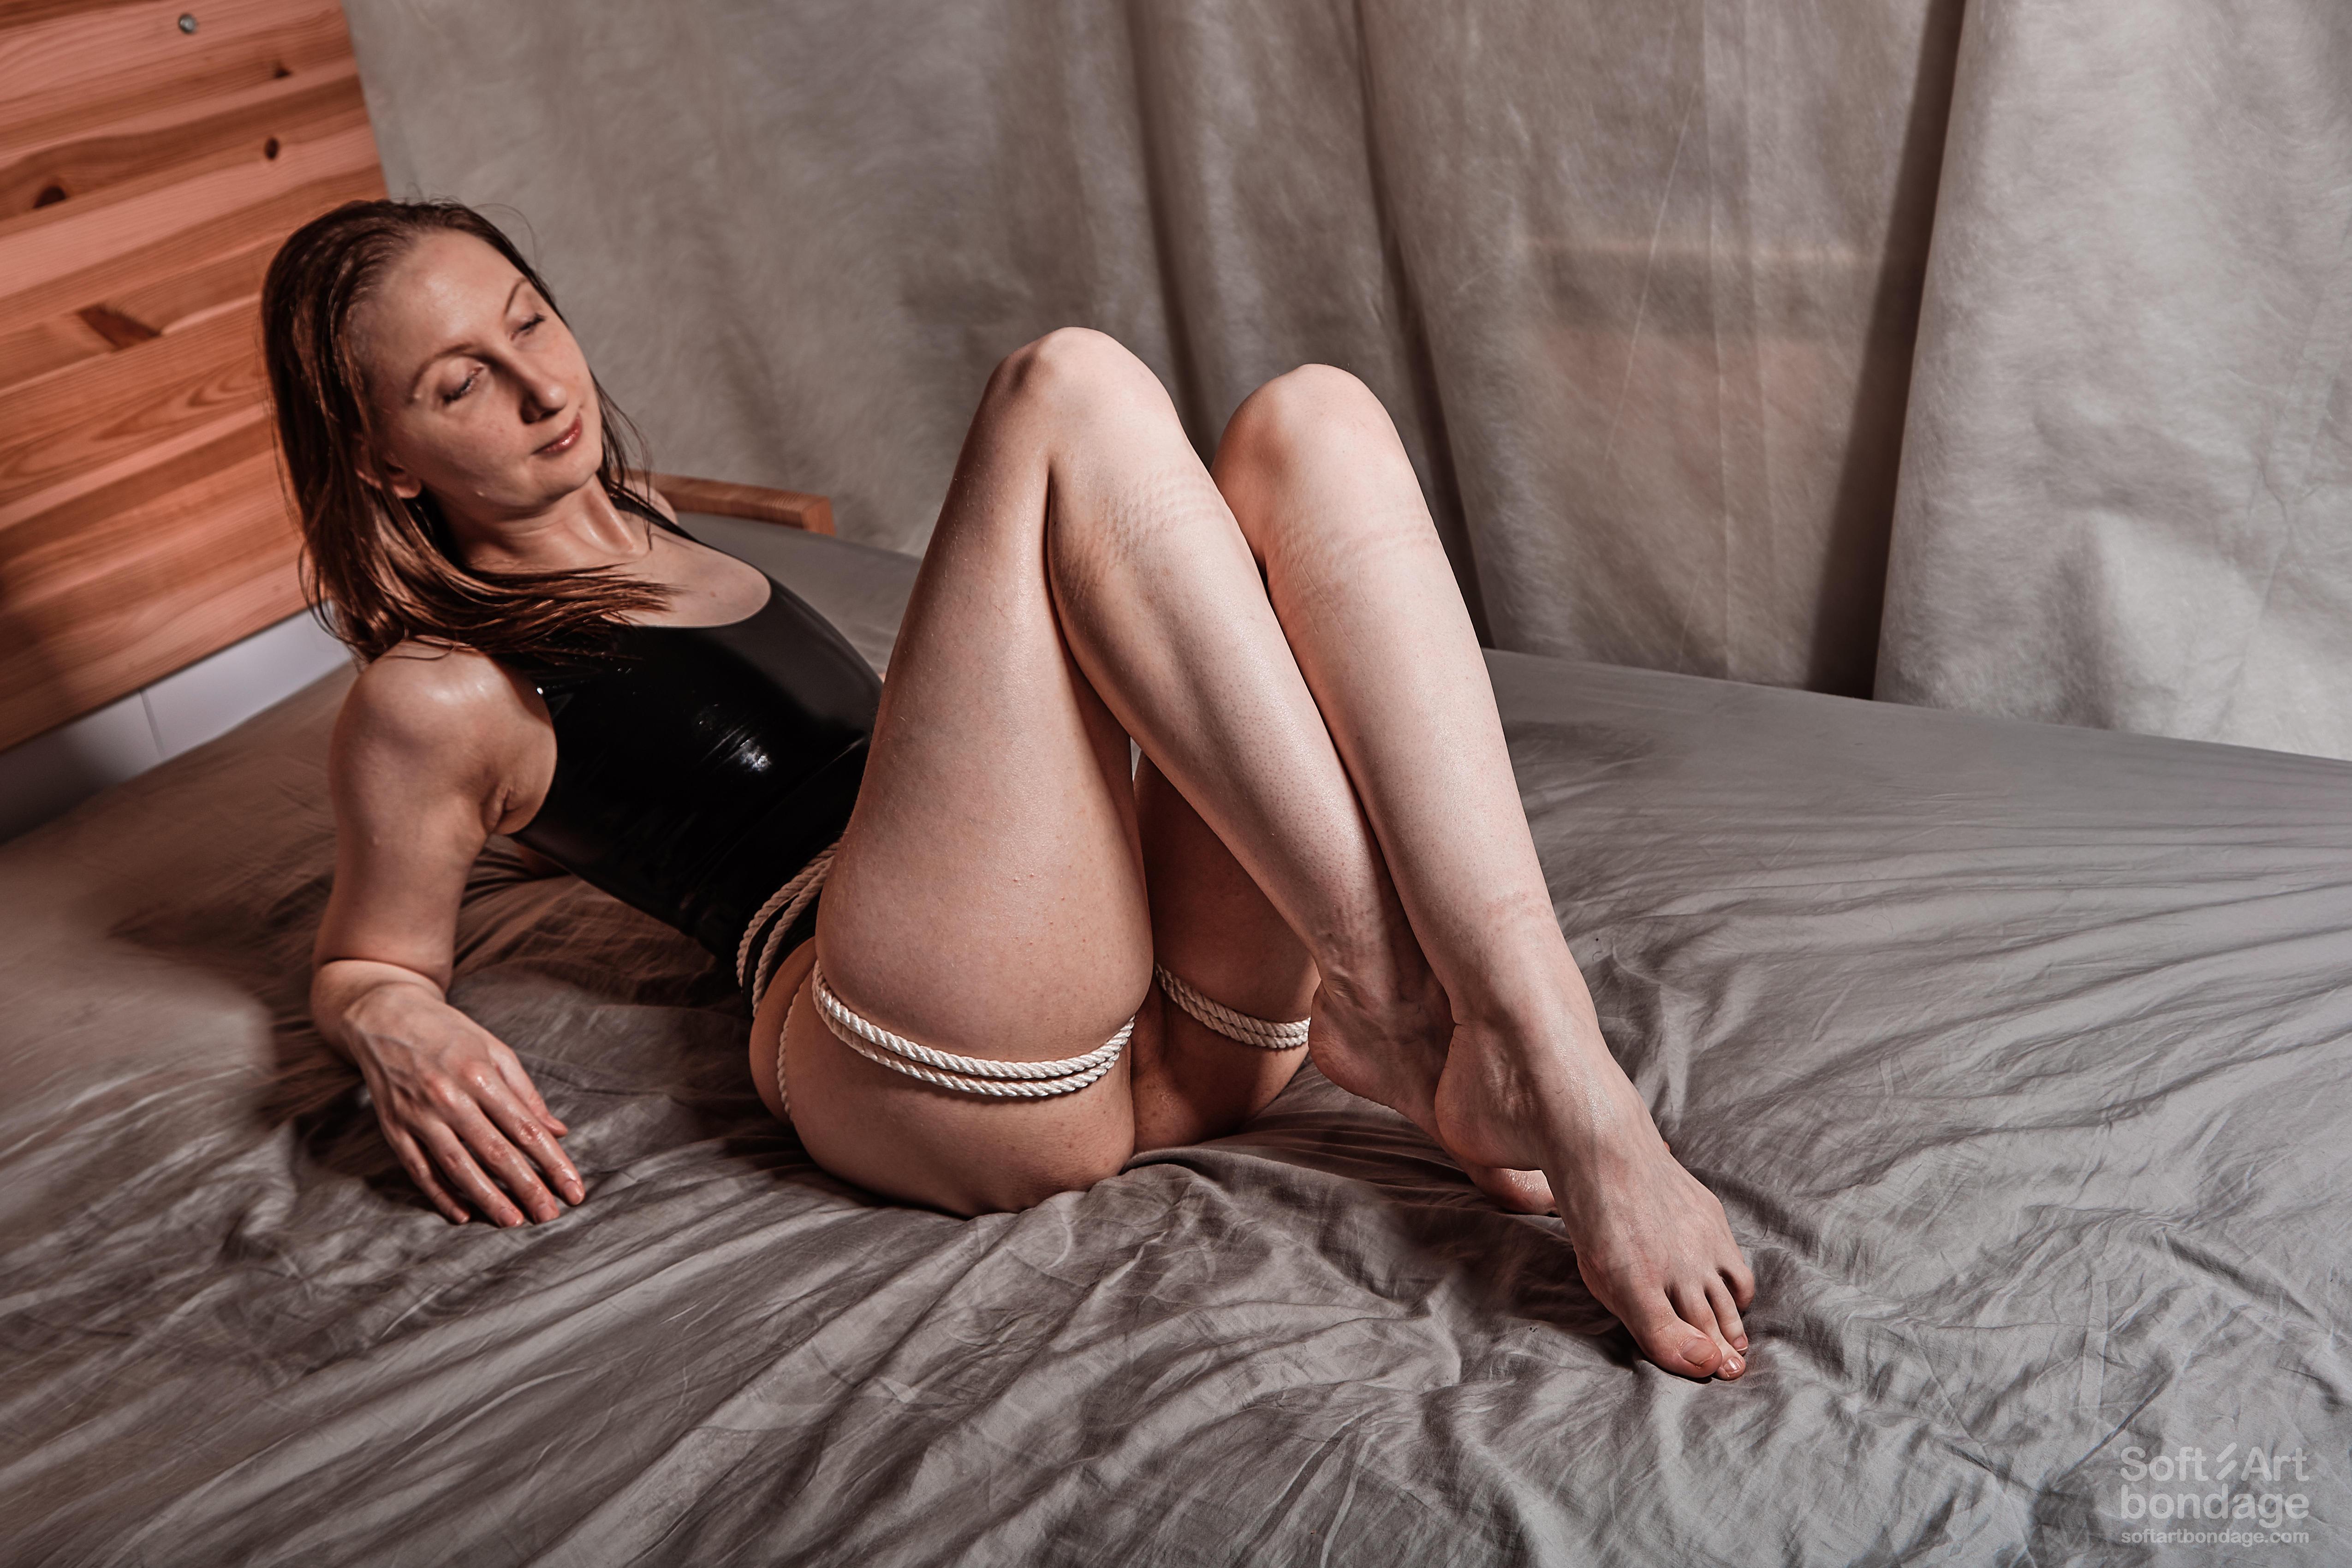 pics pics pussyvoyeur nudist